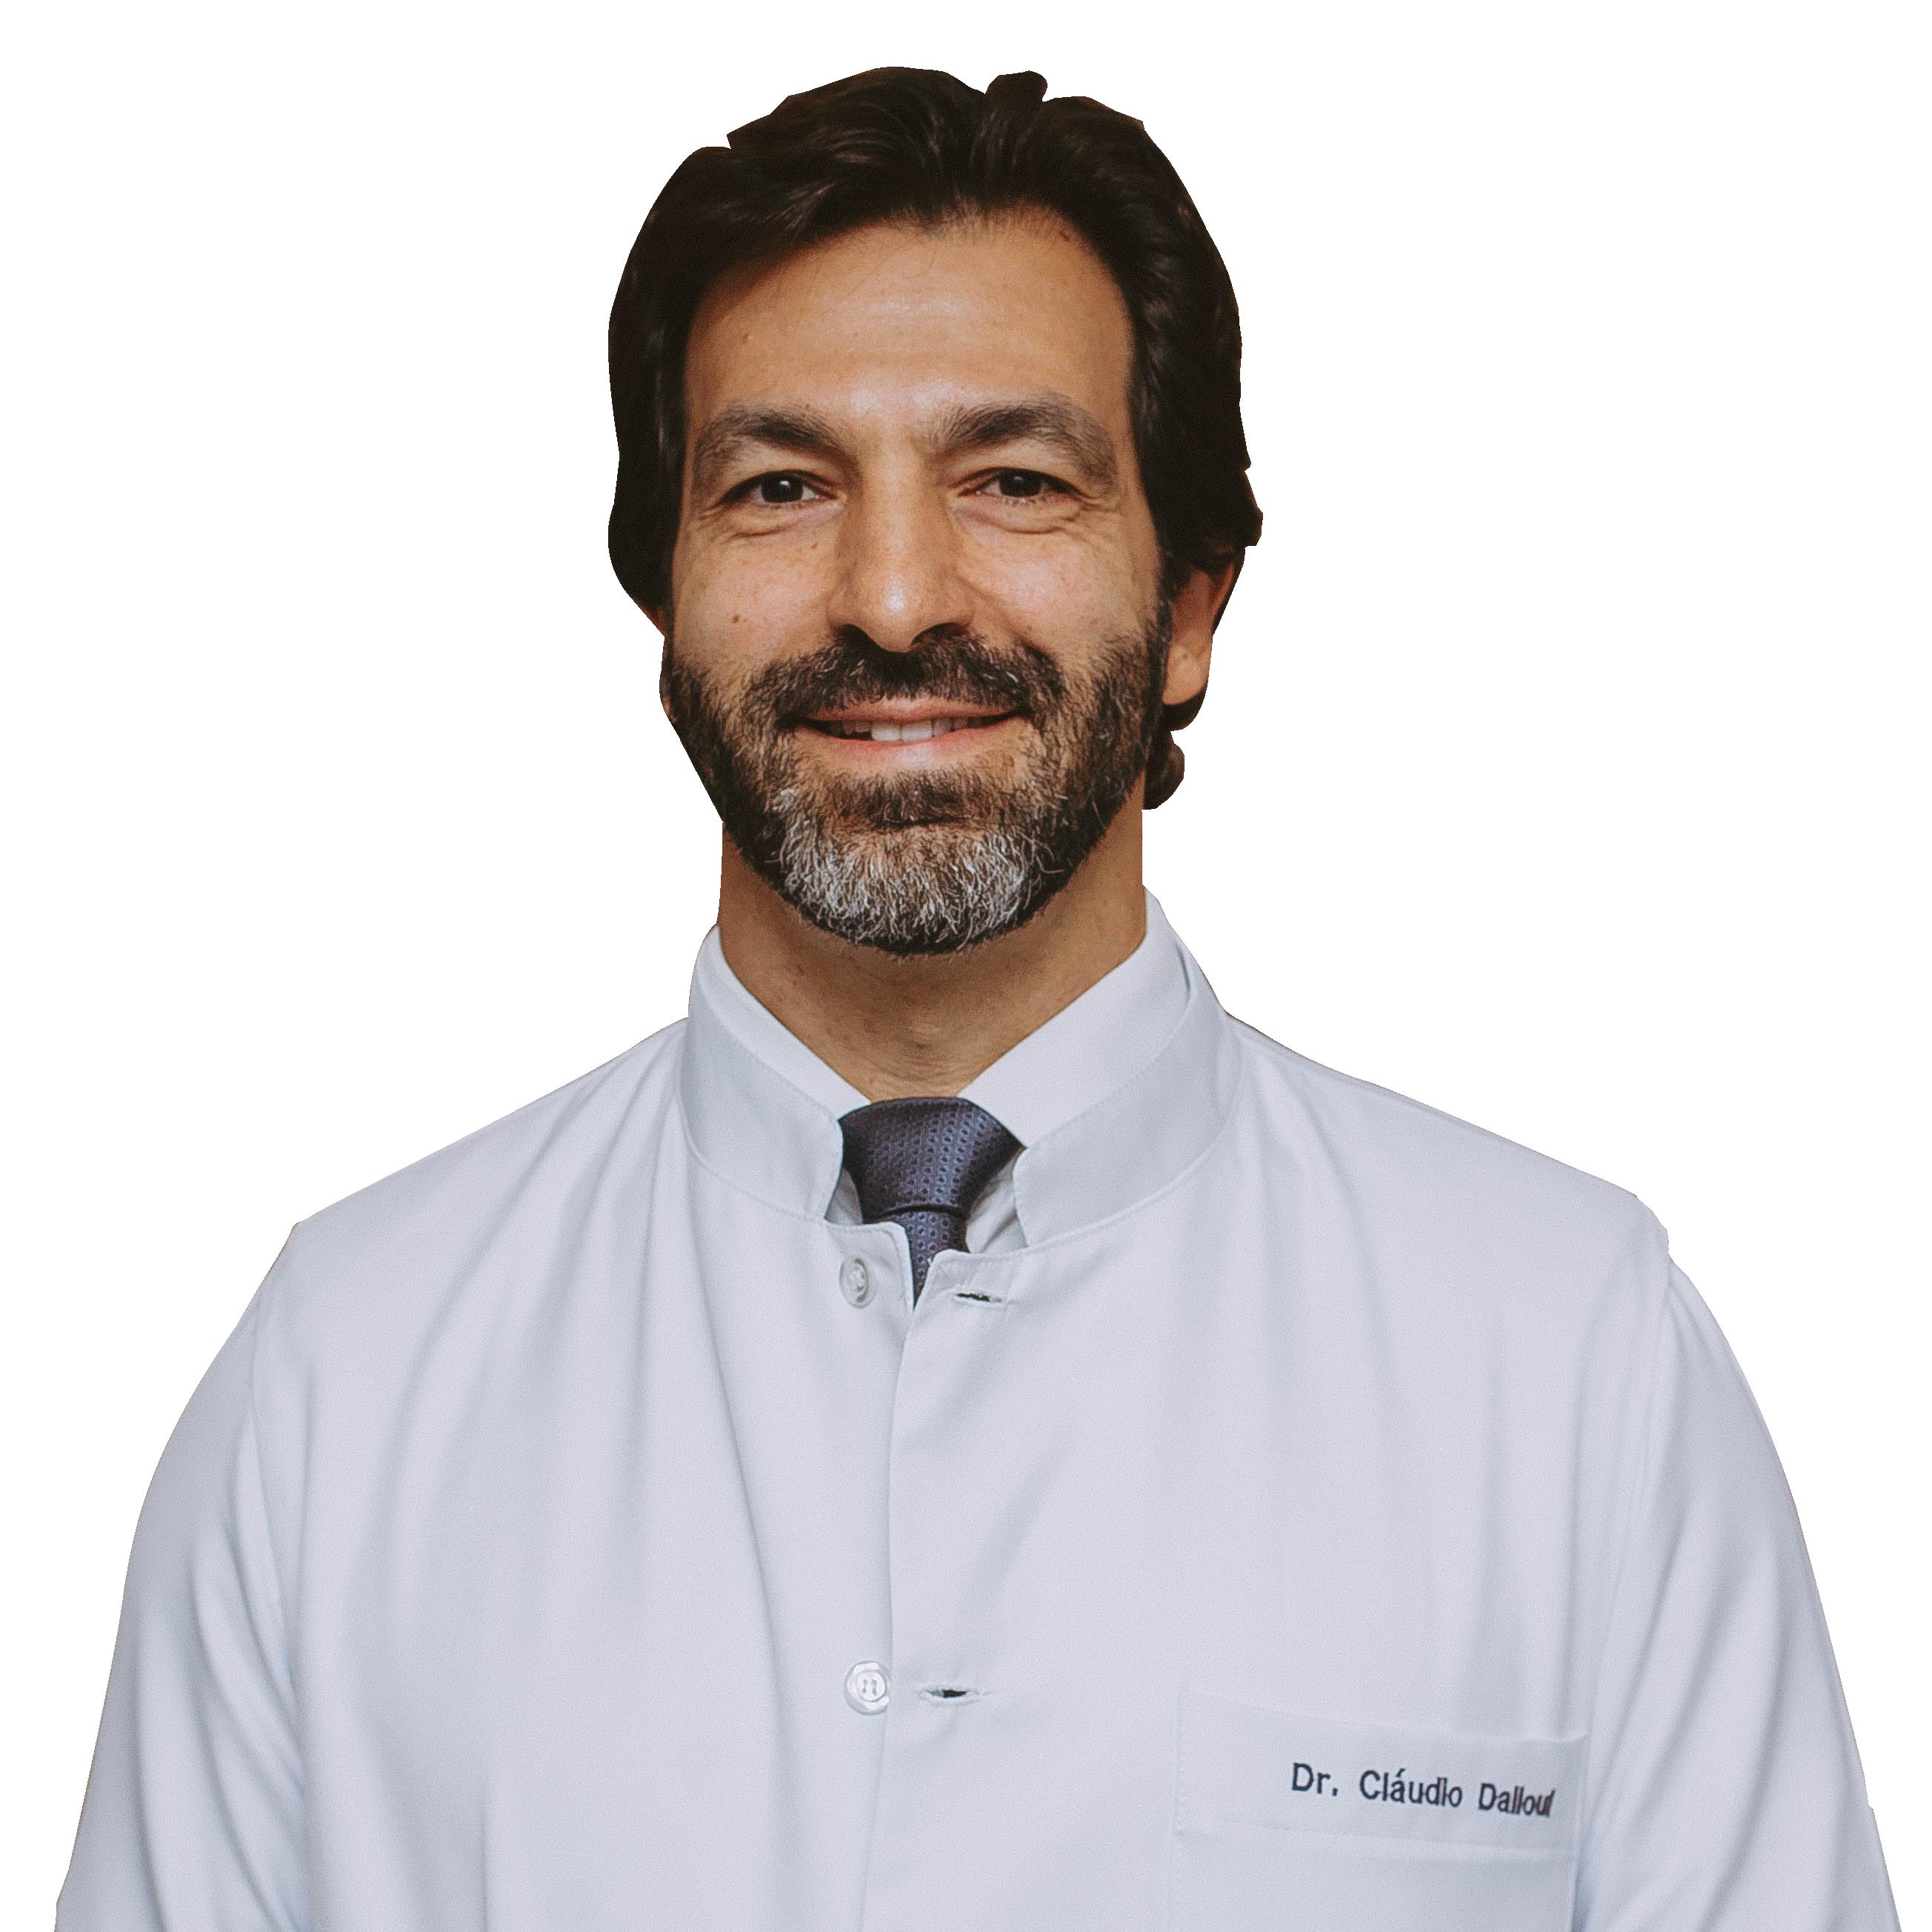 Dr. Cláudio Dalloul - D'Olhos Hospital Dia